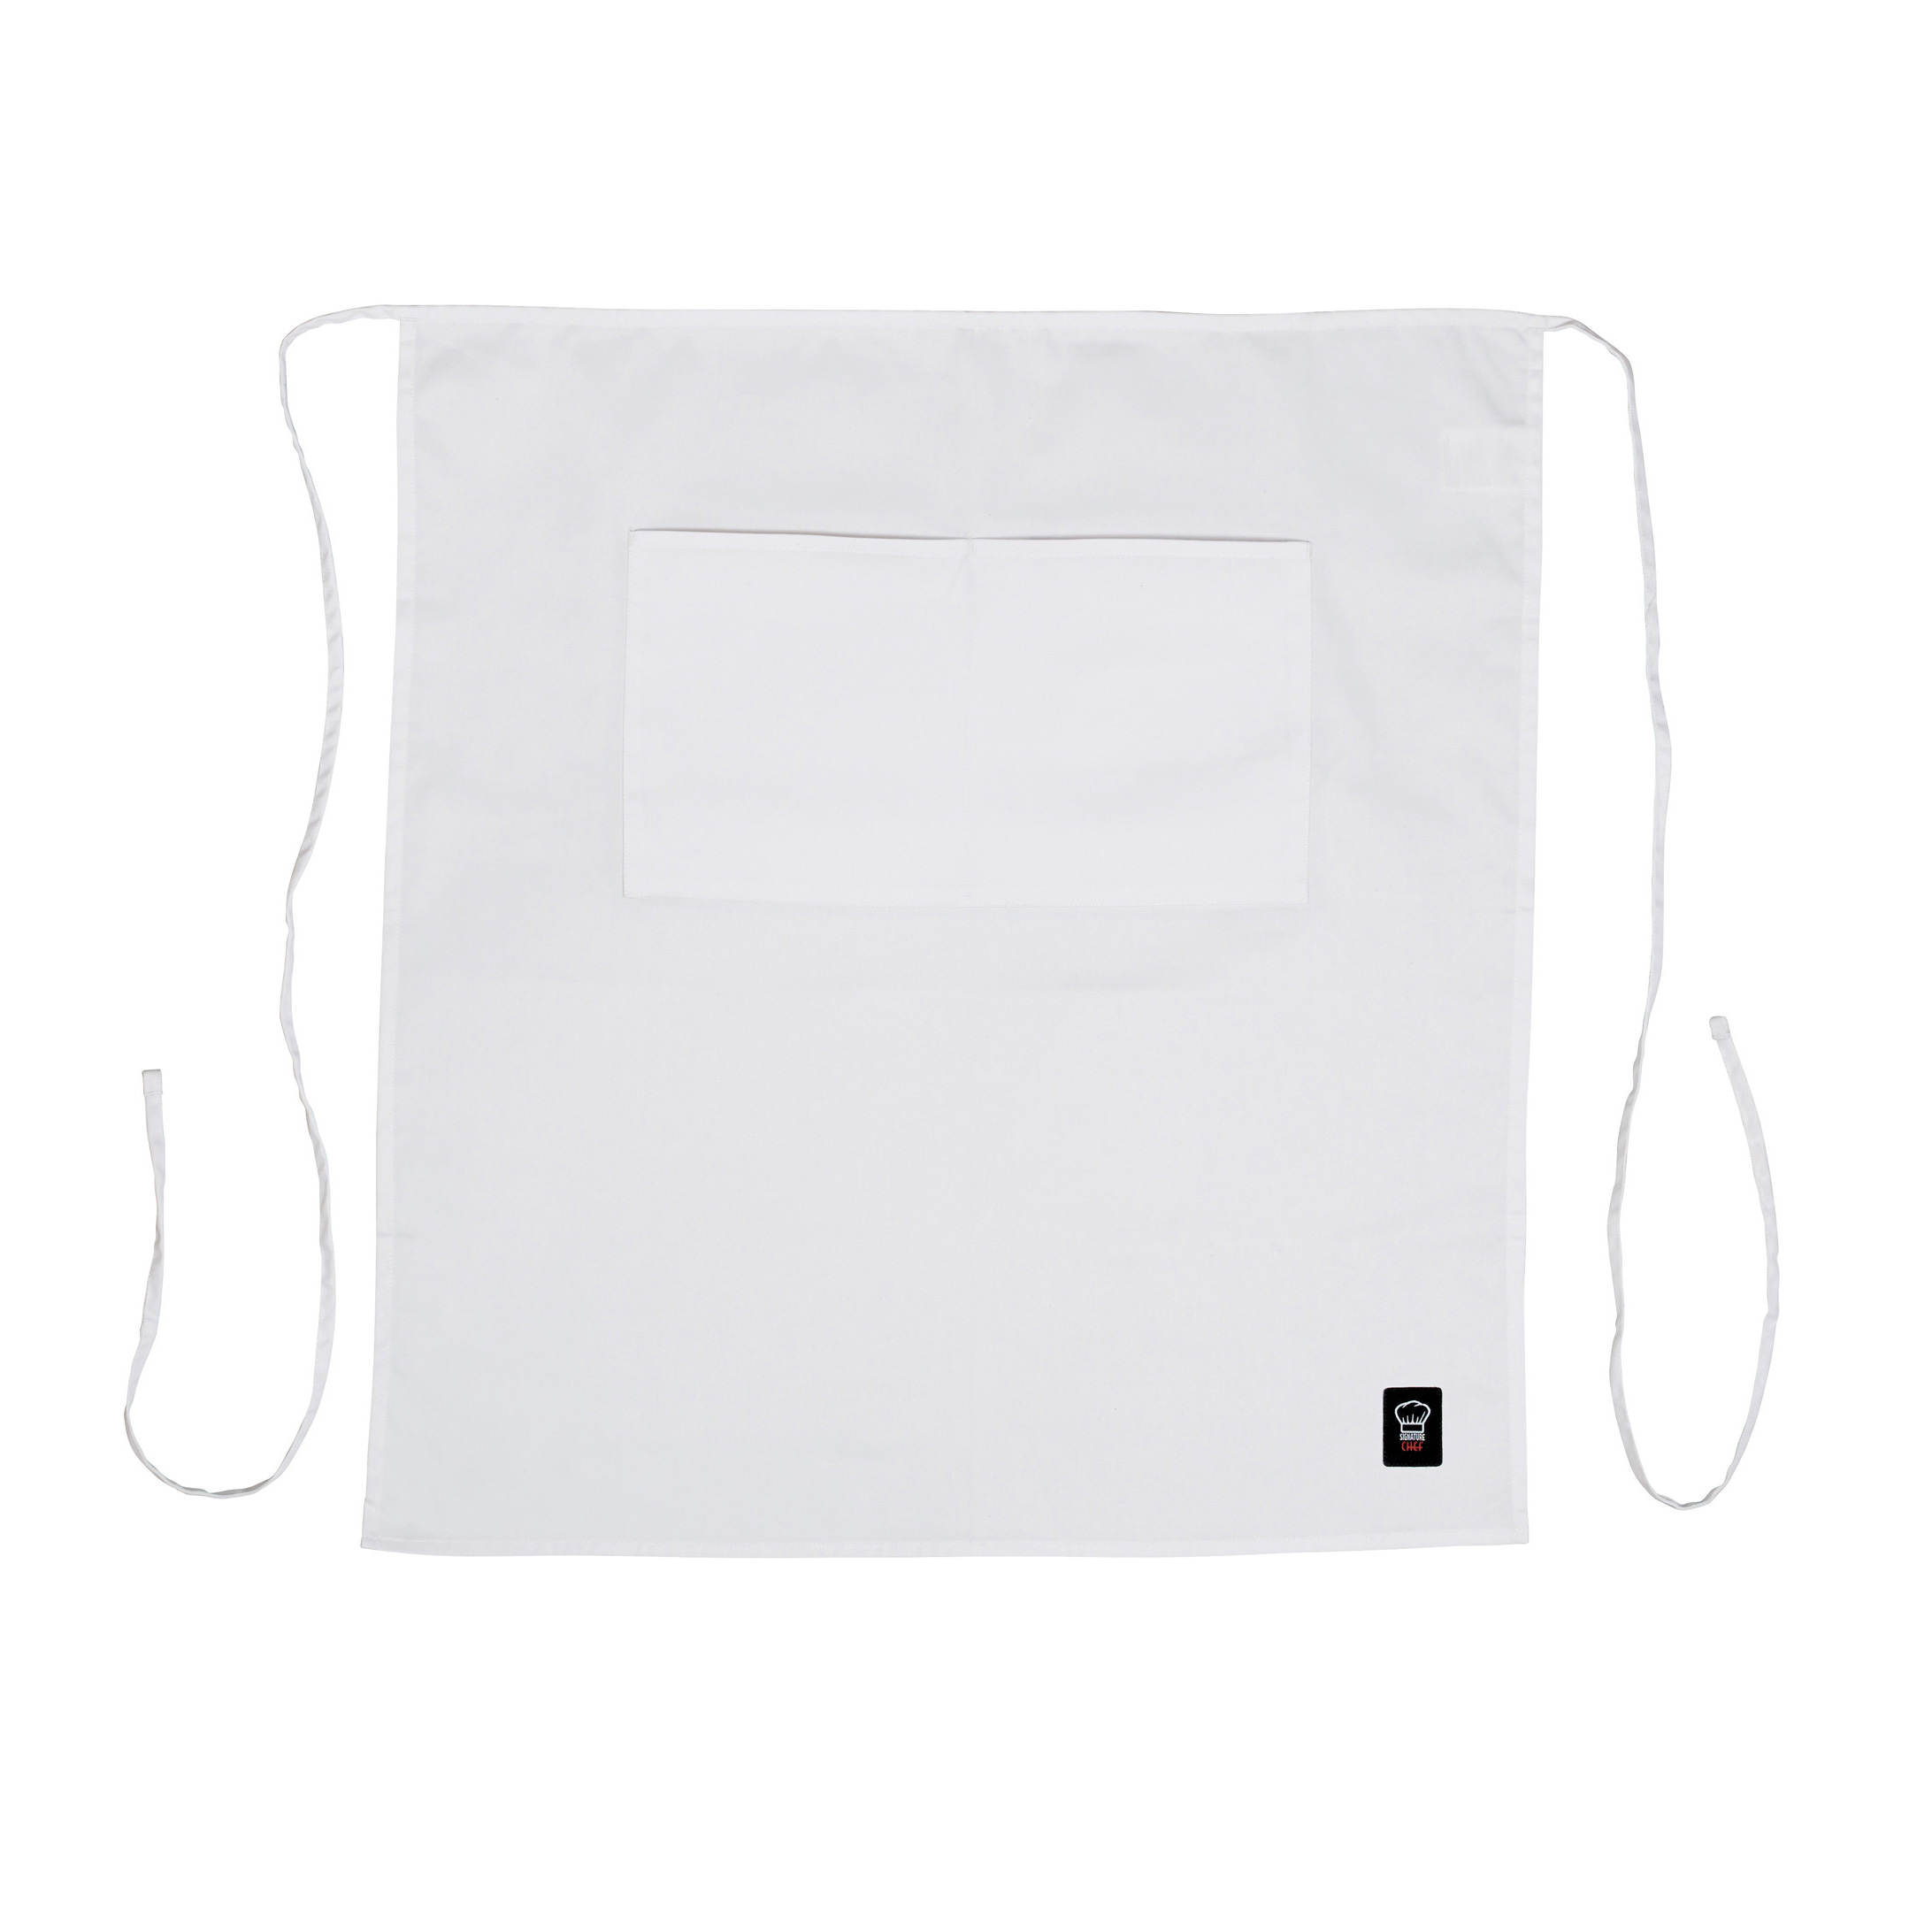 Winco WA-3129WH waist apron